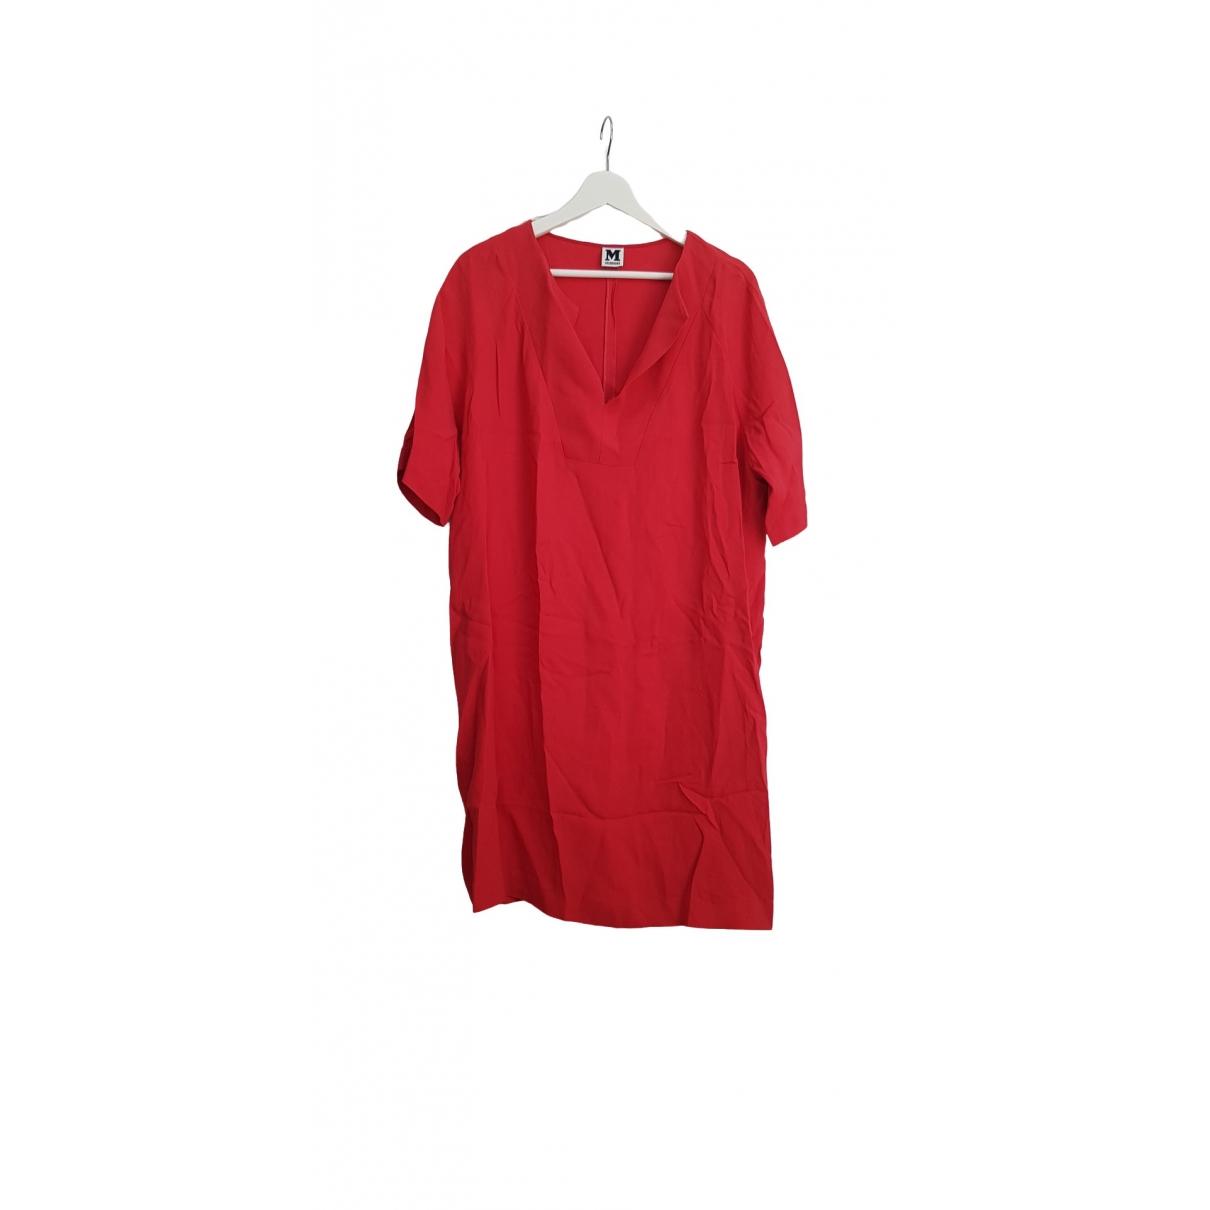 M Missoni \N Red dress for Women 44 IT